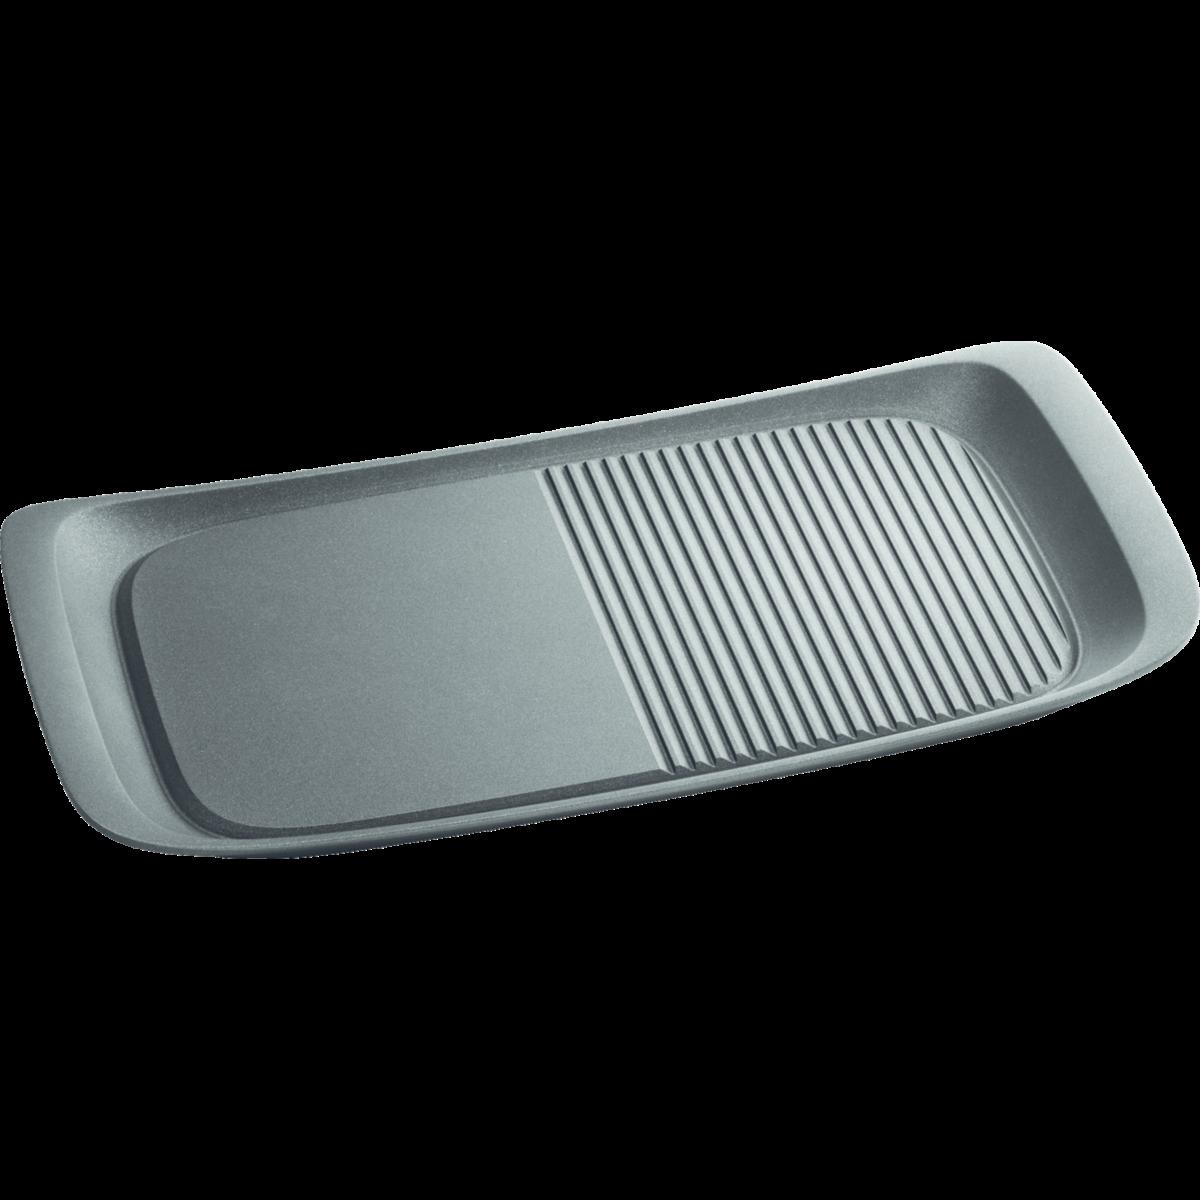 Maxisense® Plancha grill